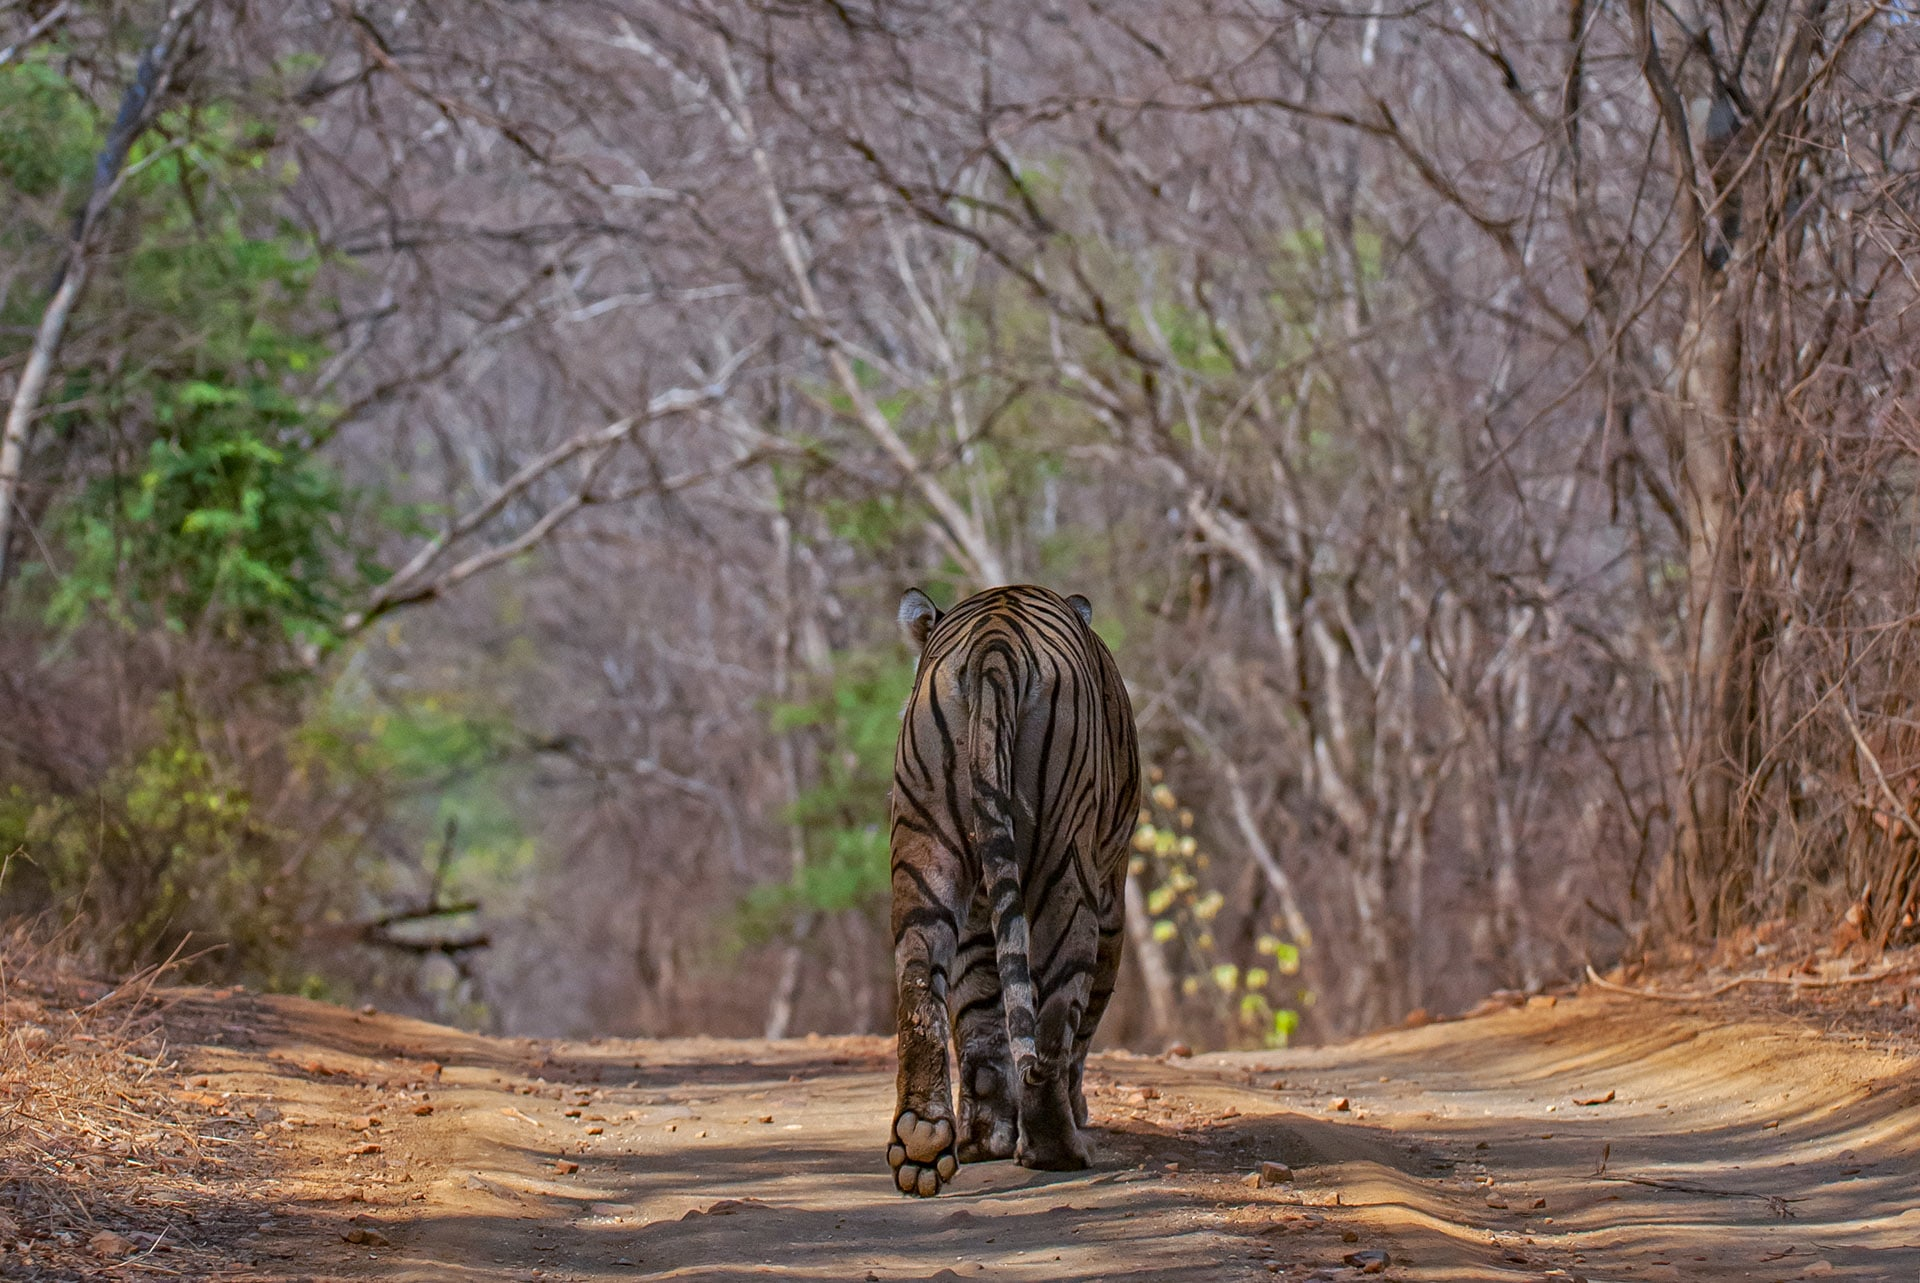 A Bengal tiger walks away, uninterested in its admirers. Photo: Dhritiman Mukherjee